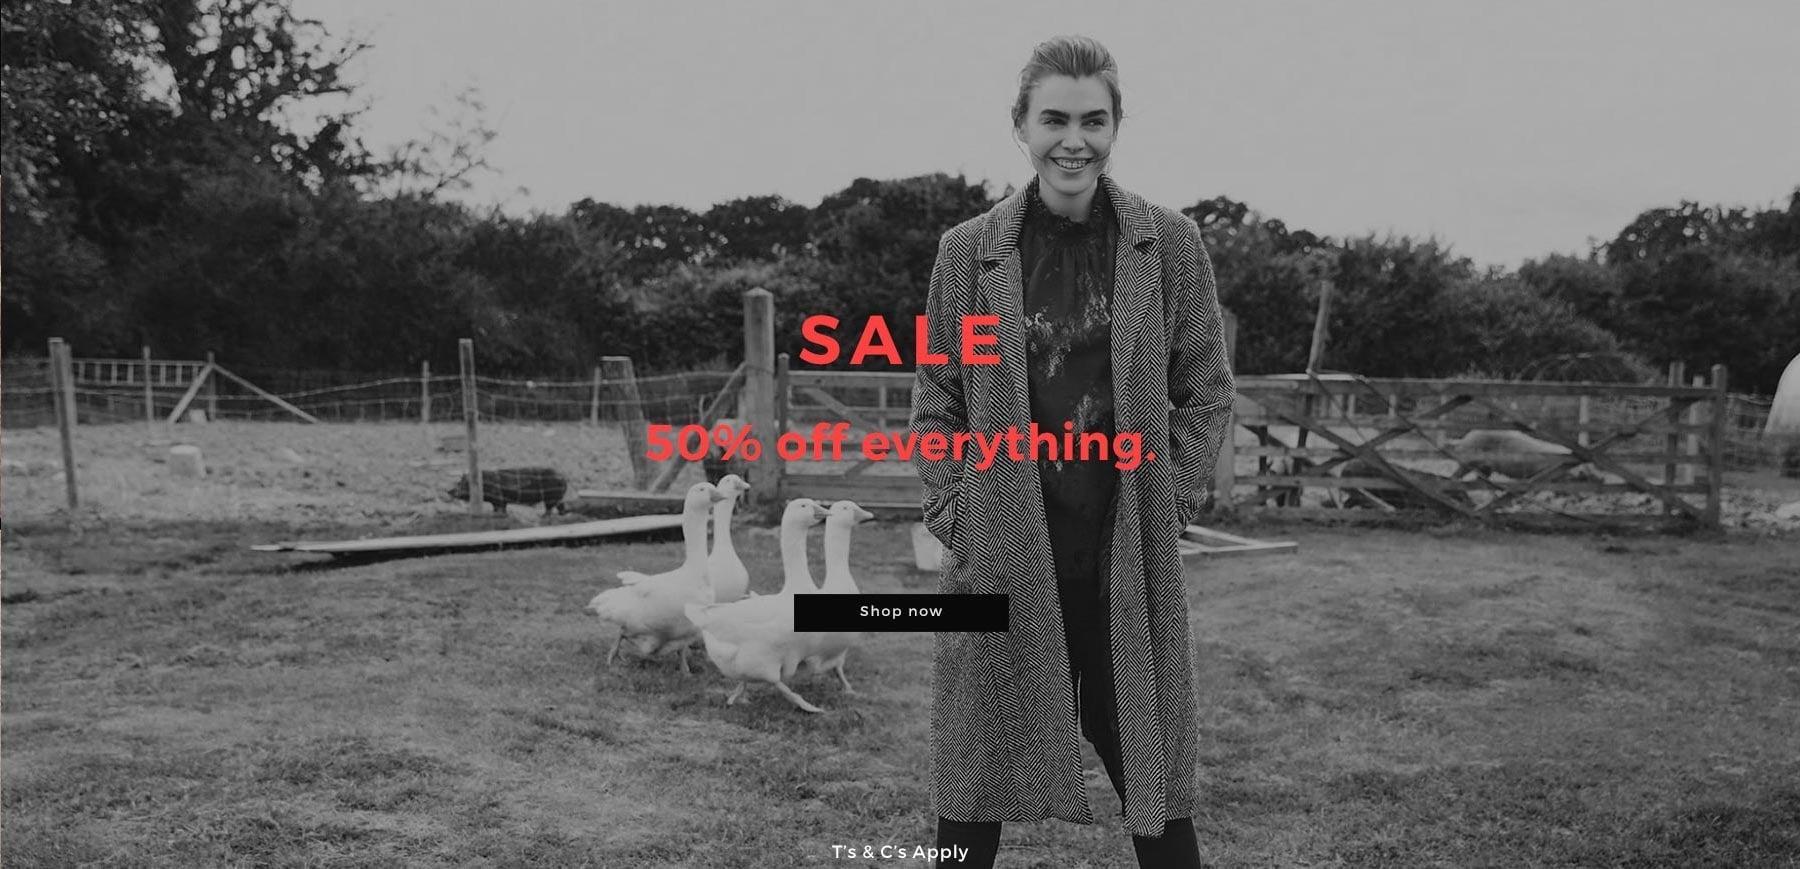 Elvi Elvi: Sale 50% off everything of plus size clothing